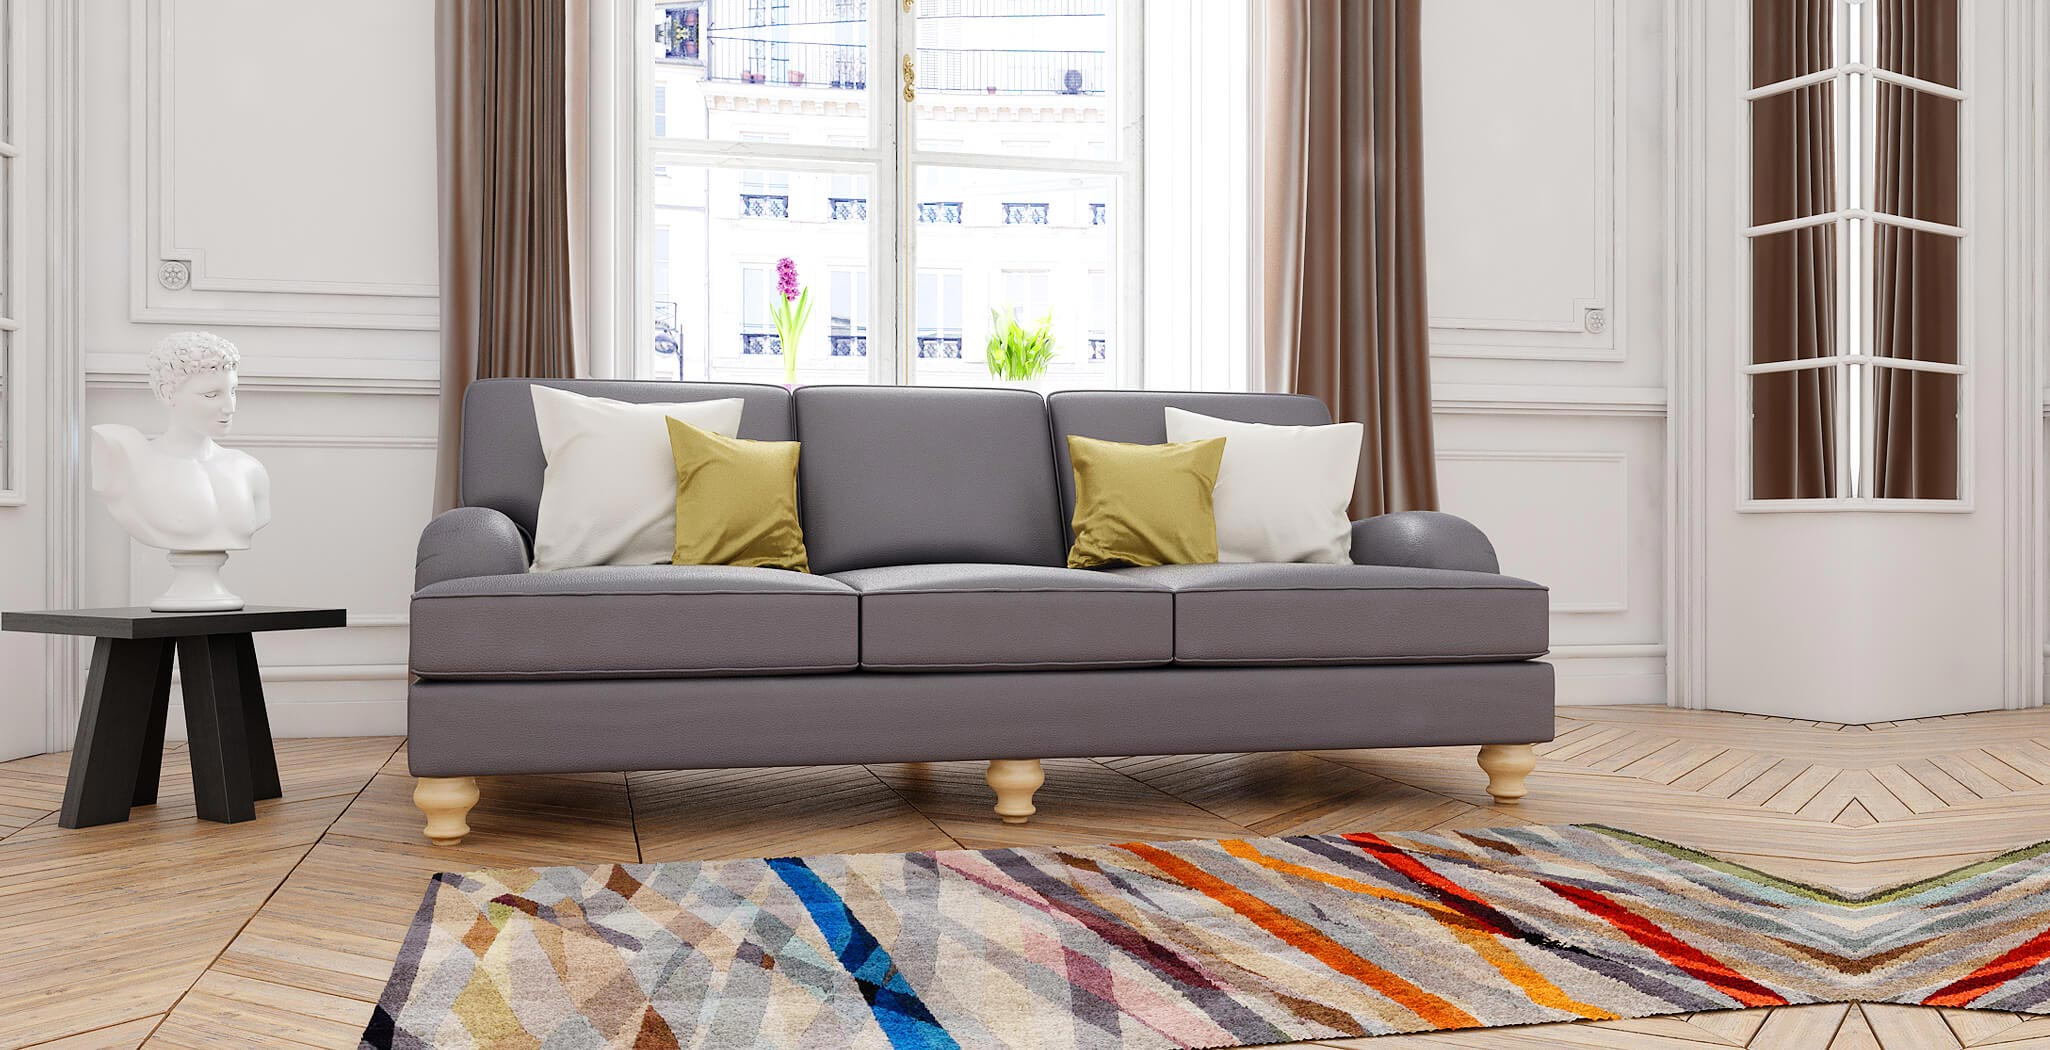 hamilton sofa furniture gallery 3